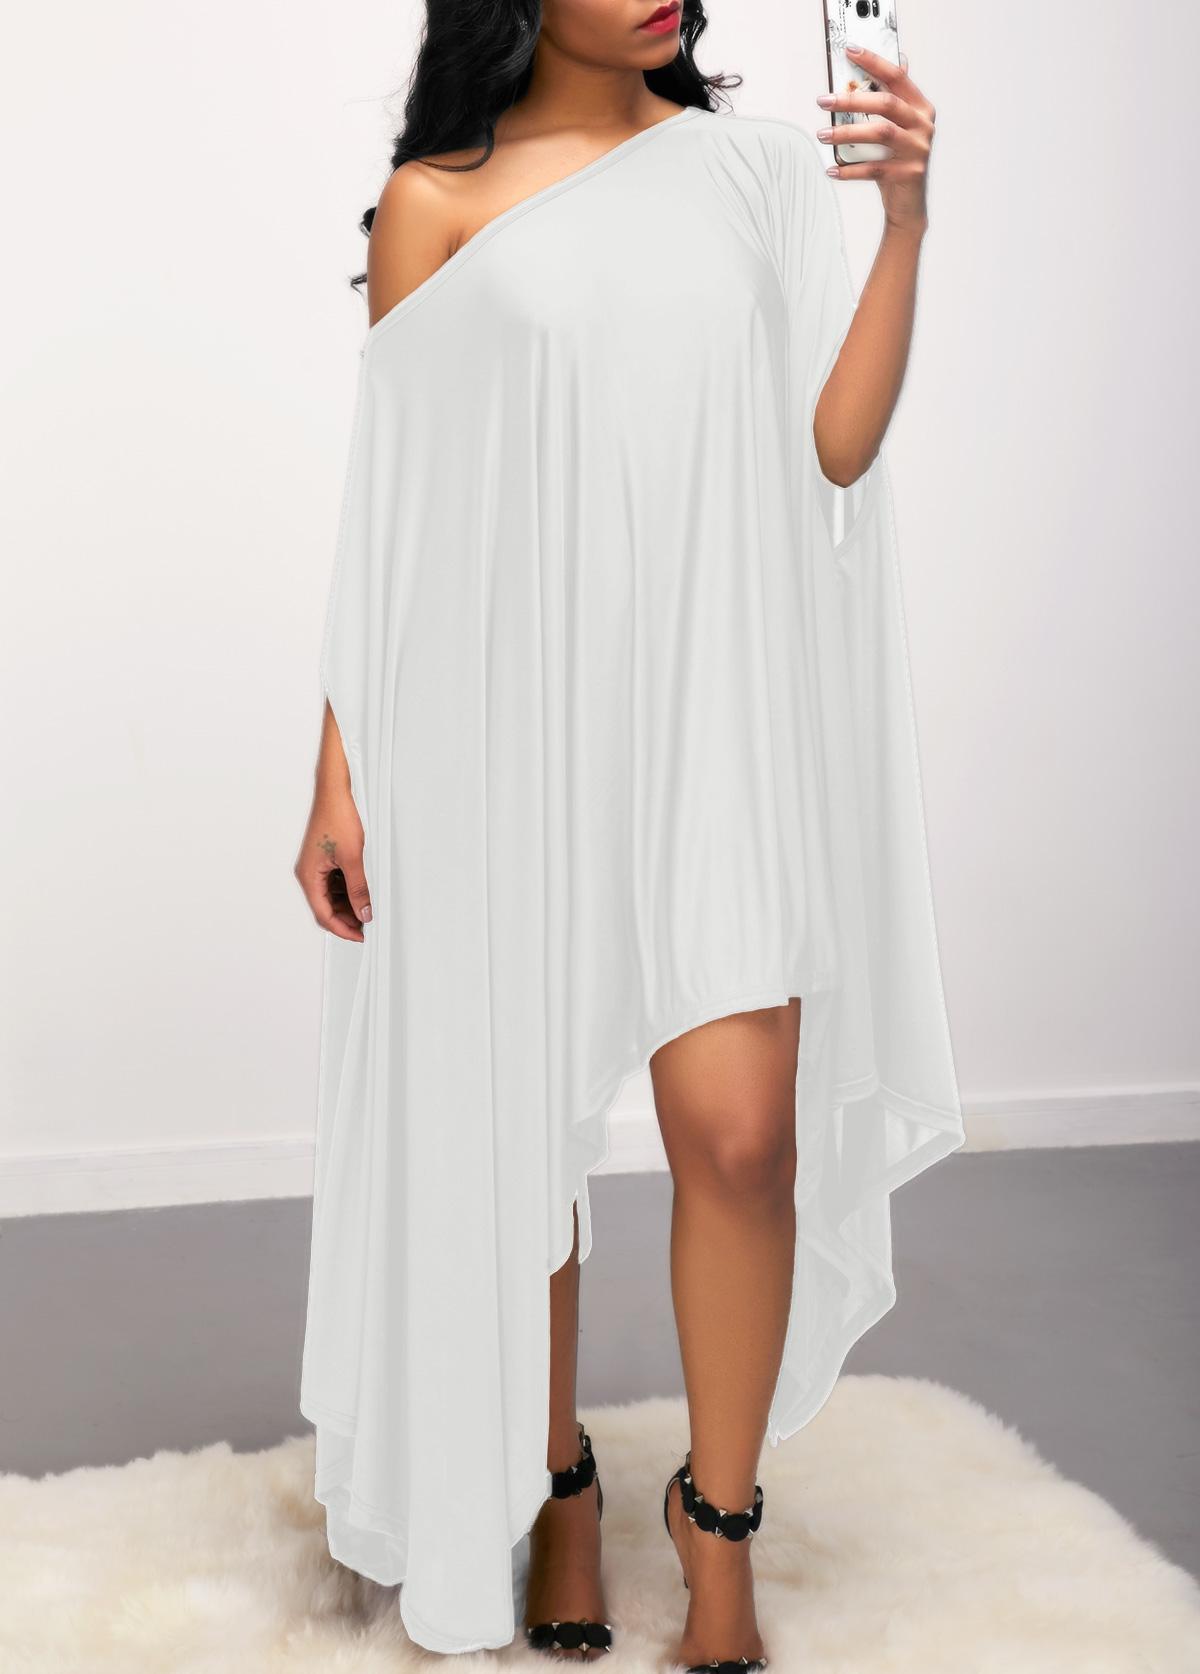 Batwing Sleeve Asymmetric Hem White Dress